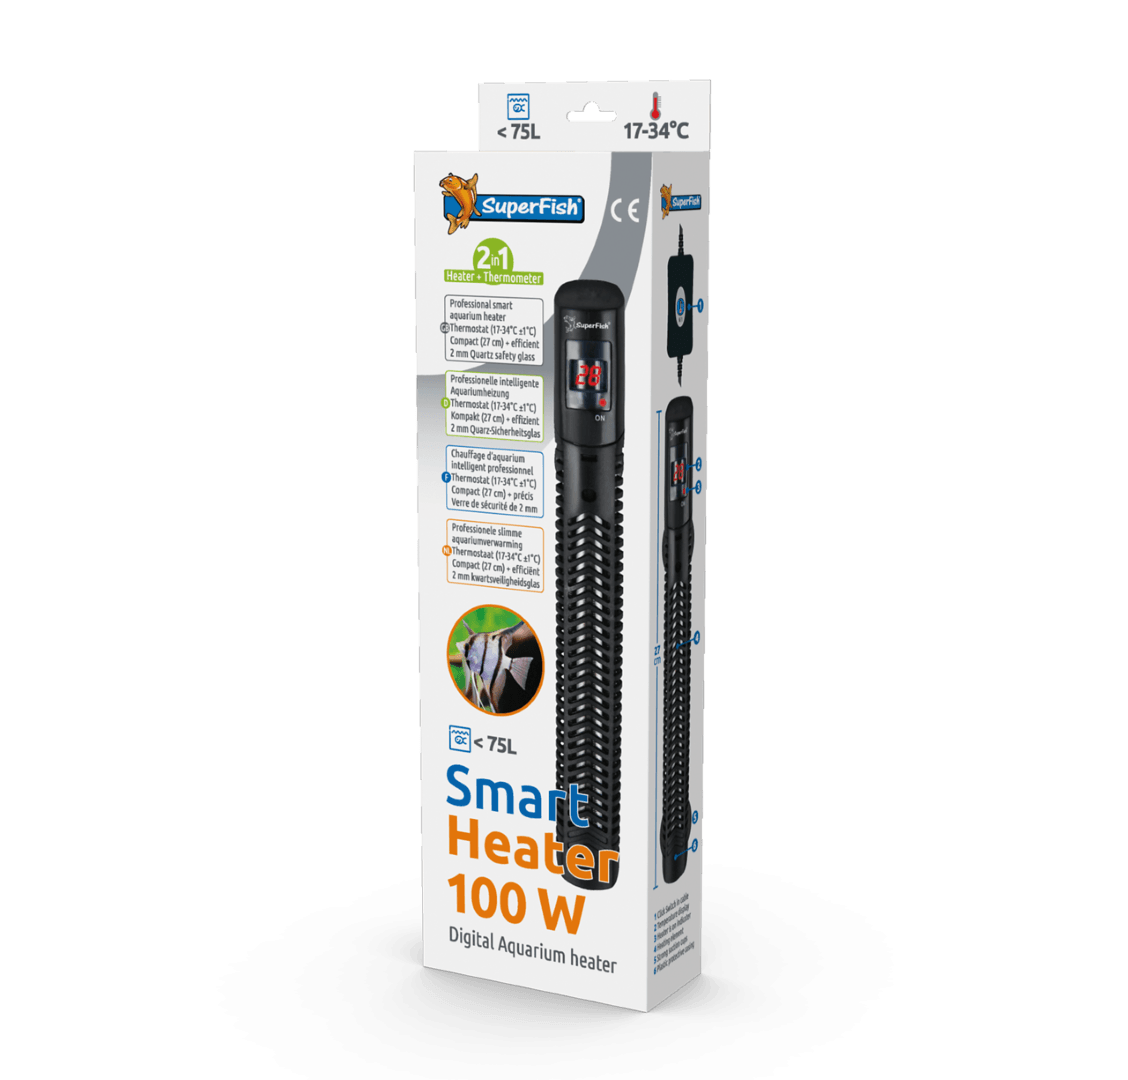 Superfish smart heater 100 watt